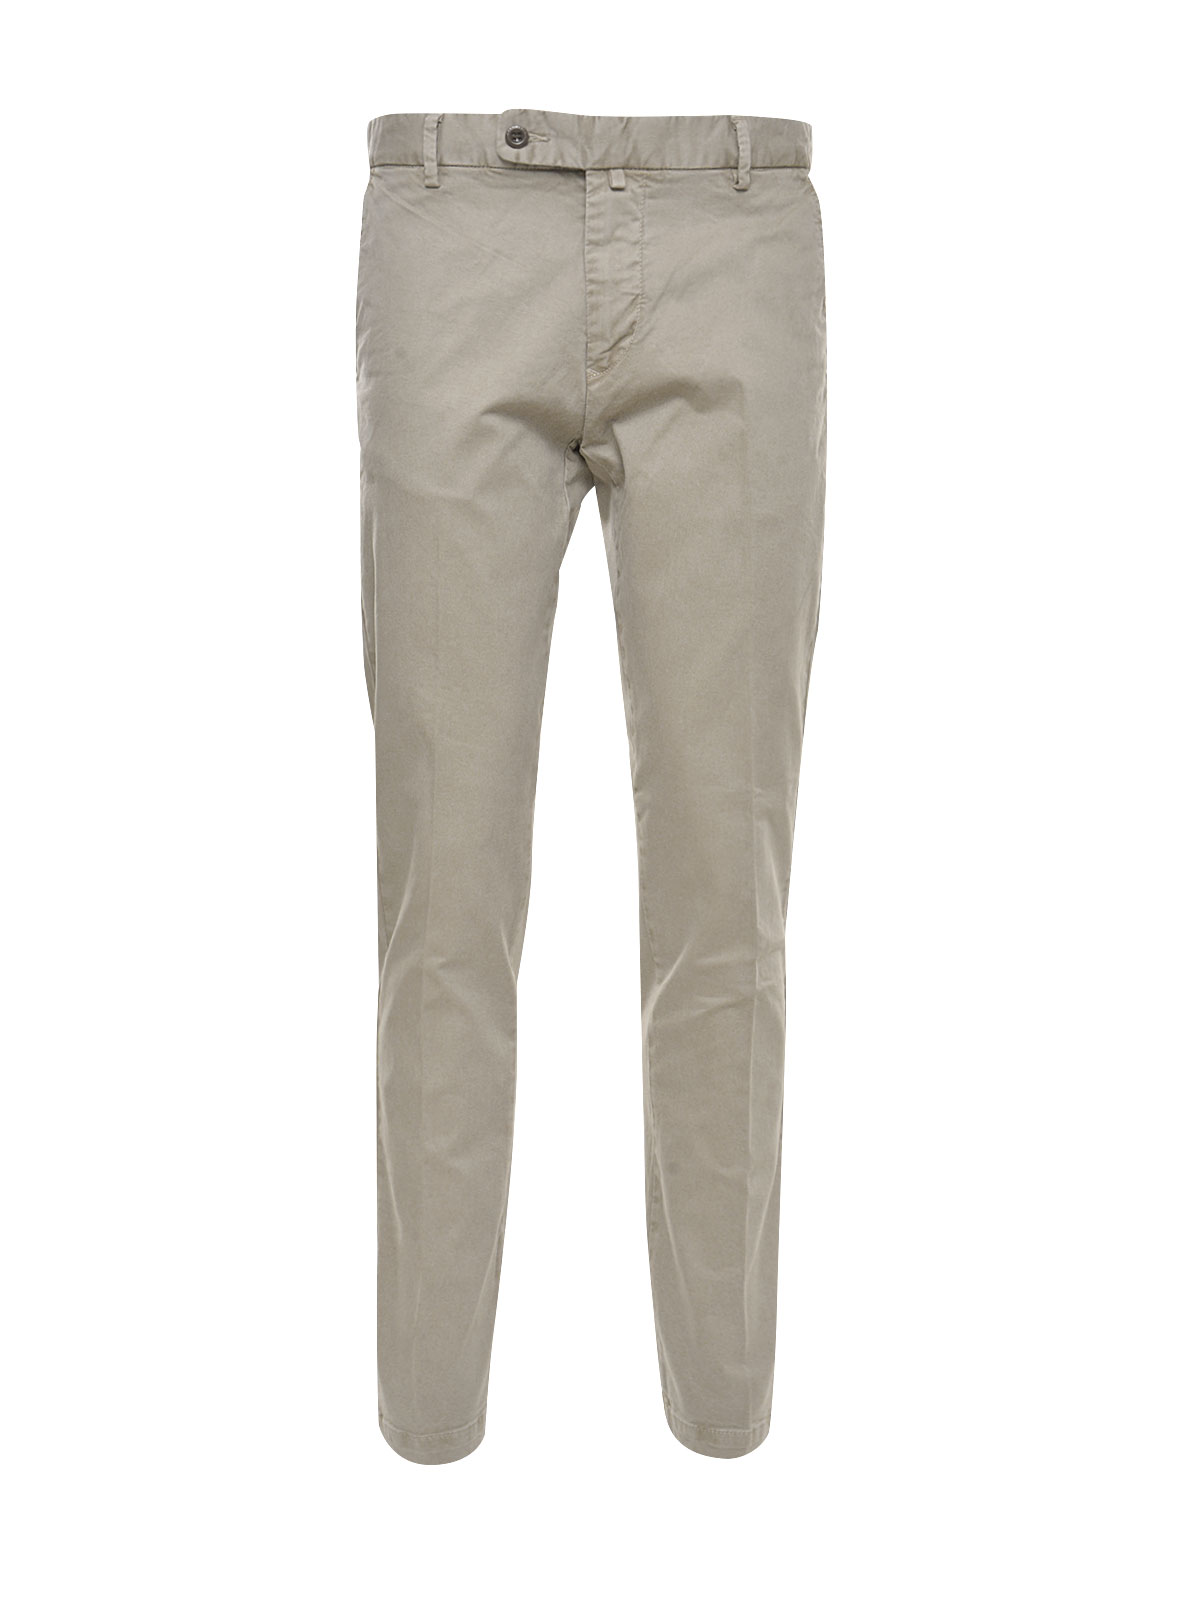 Herren Jeans und Hosen von GANT ➤ DESIGNERMODE.COM   designermode.com 8916e04c9a